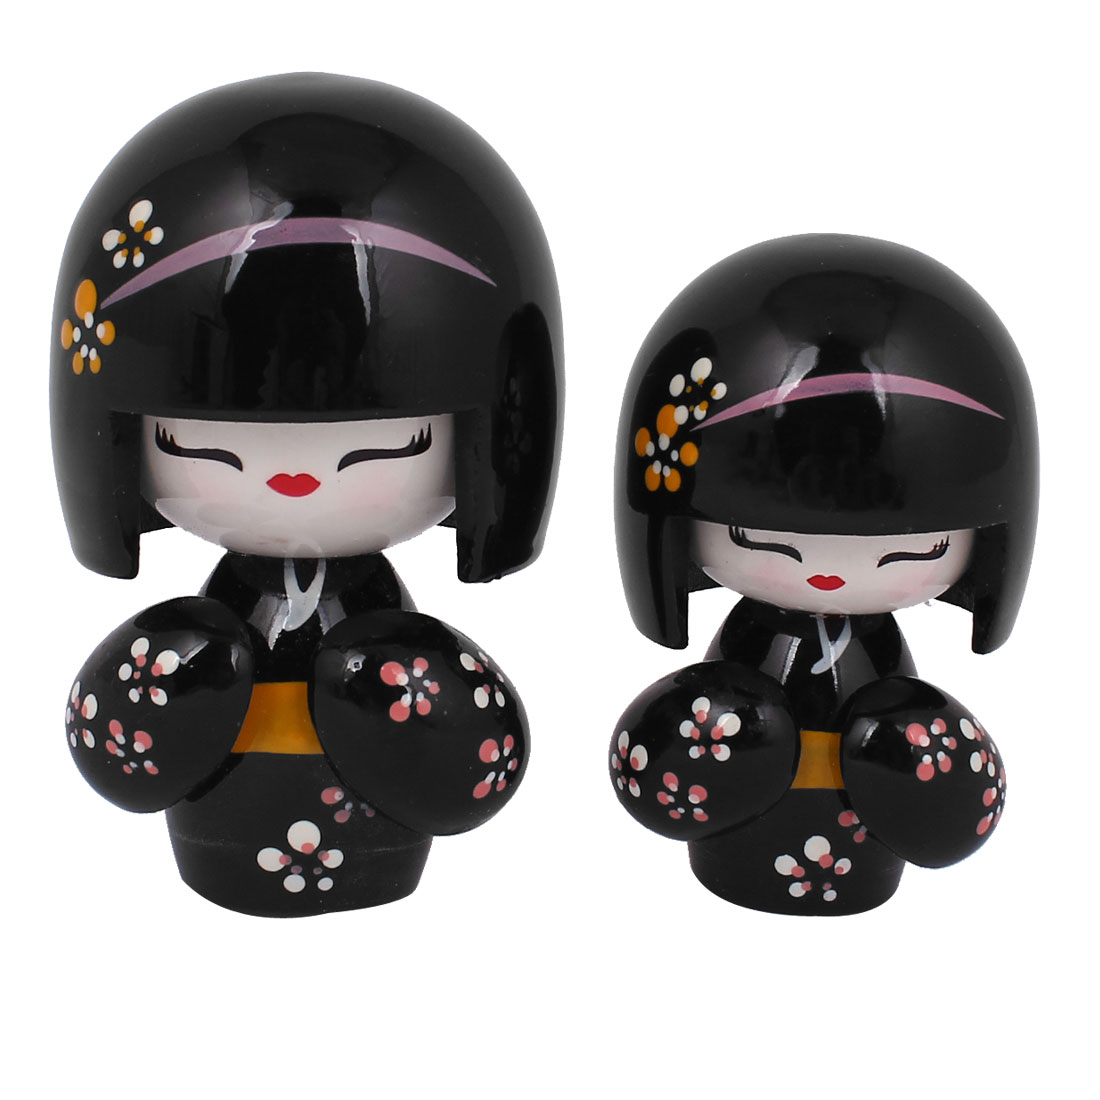 2 in 1 Black Wooden Japanese Kimono Kokeshi Doll Girl w Carved Floral Decor Desk Ornament